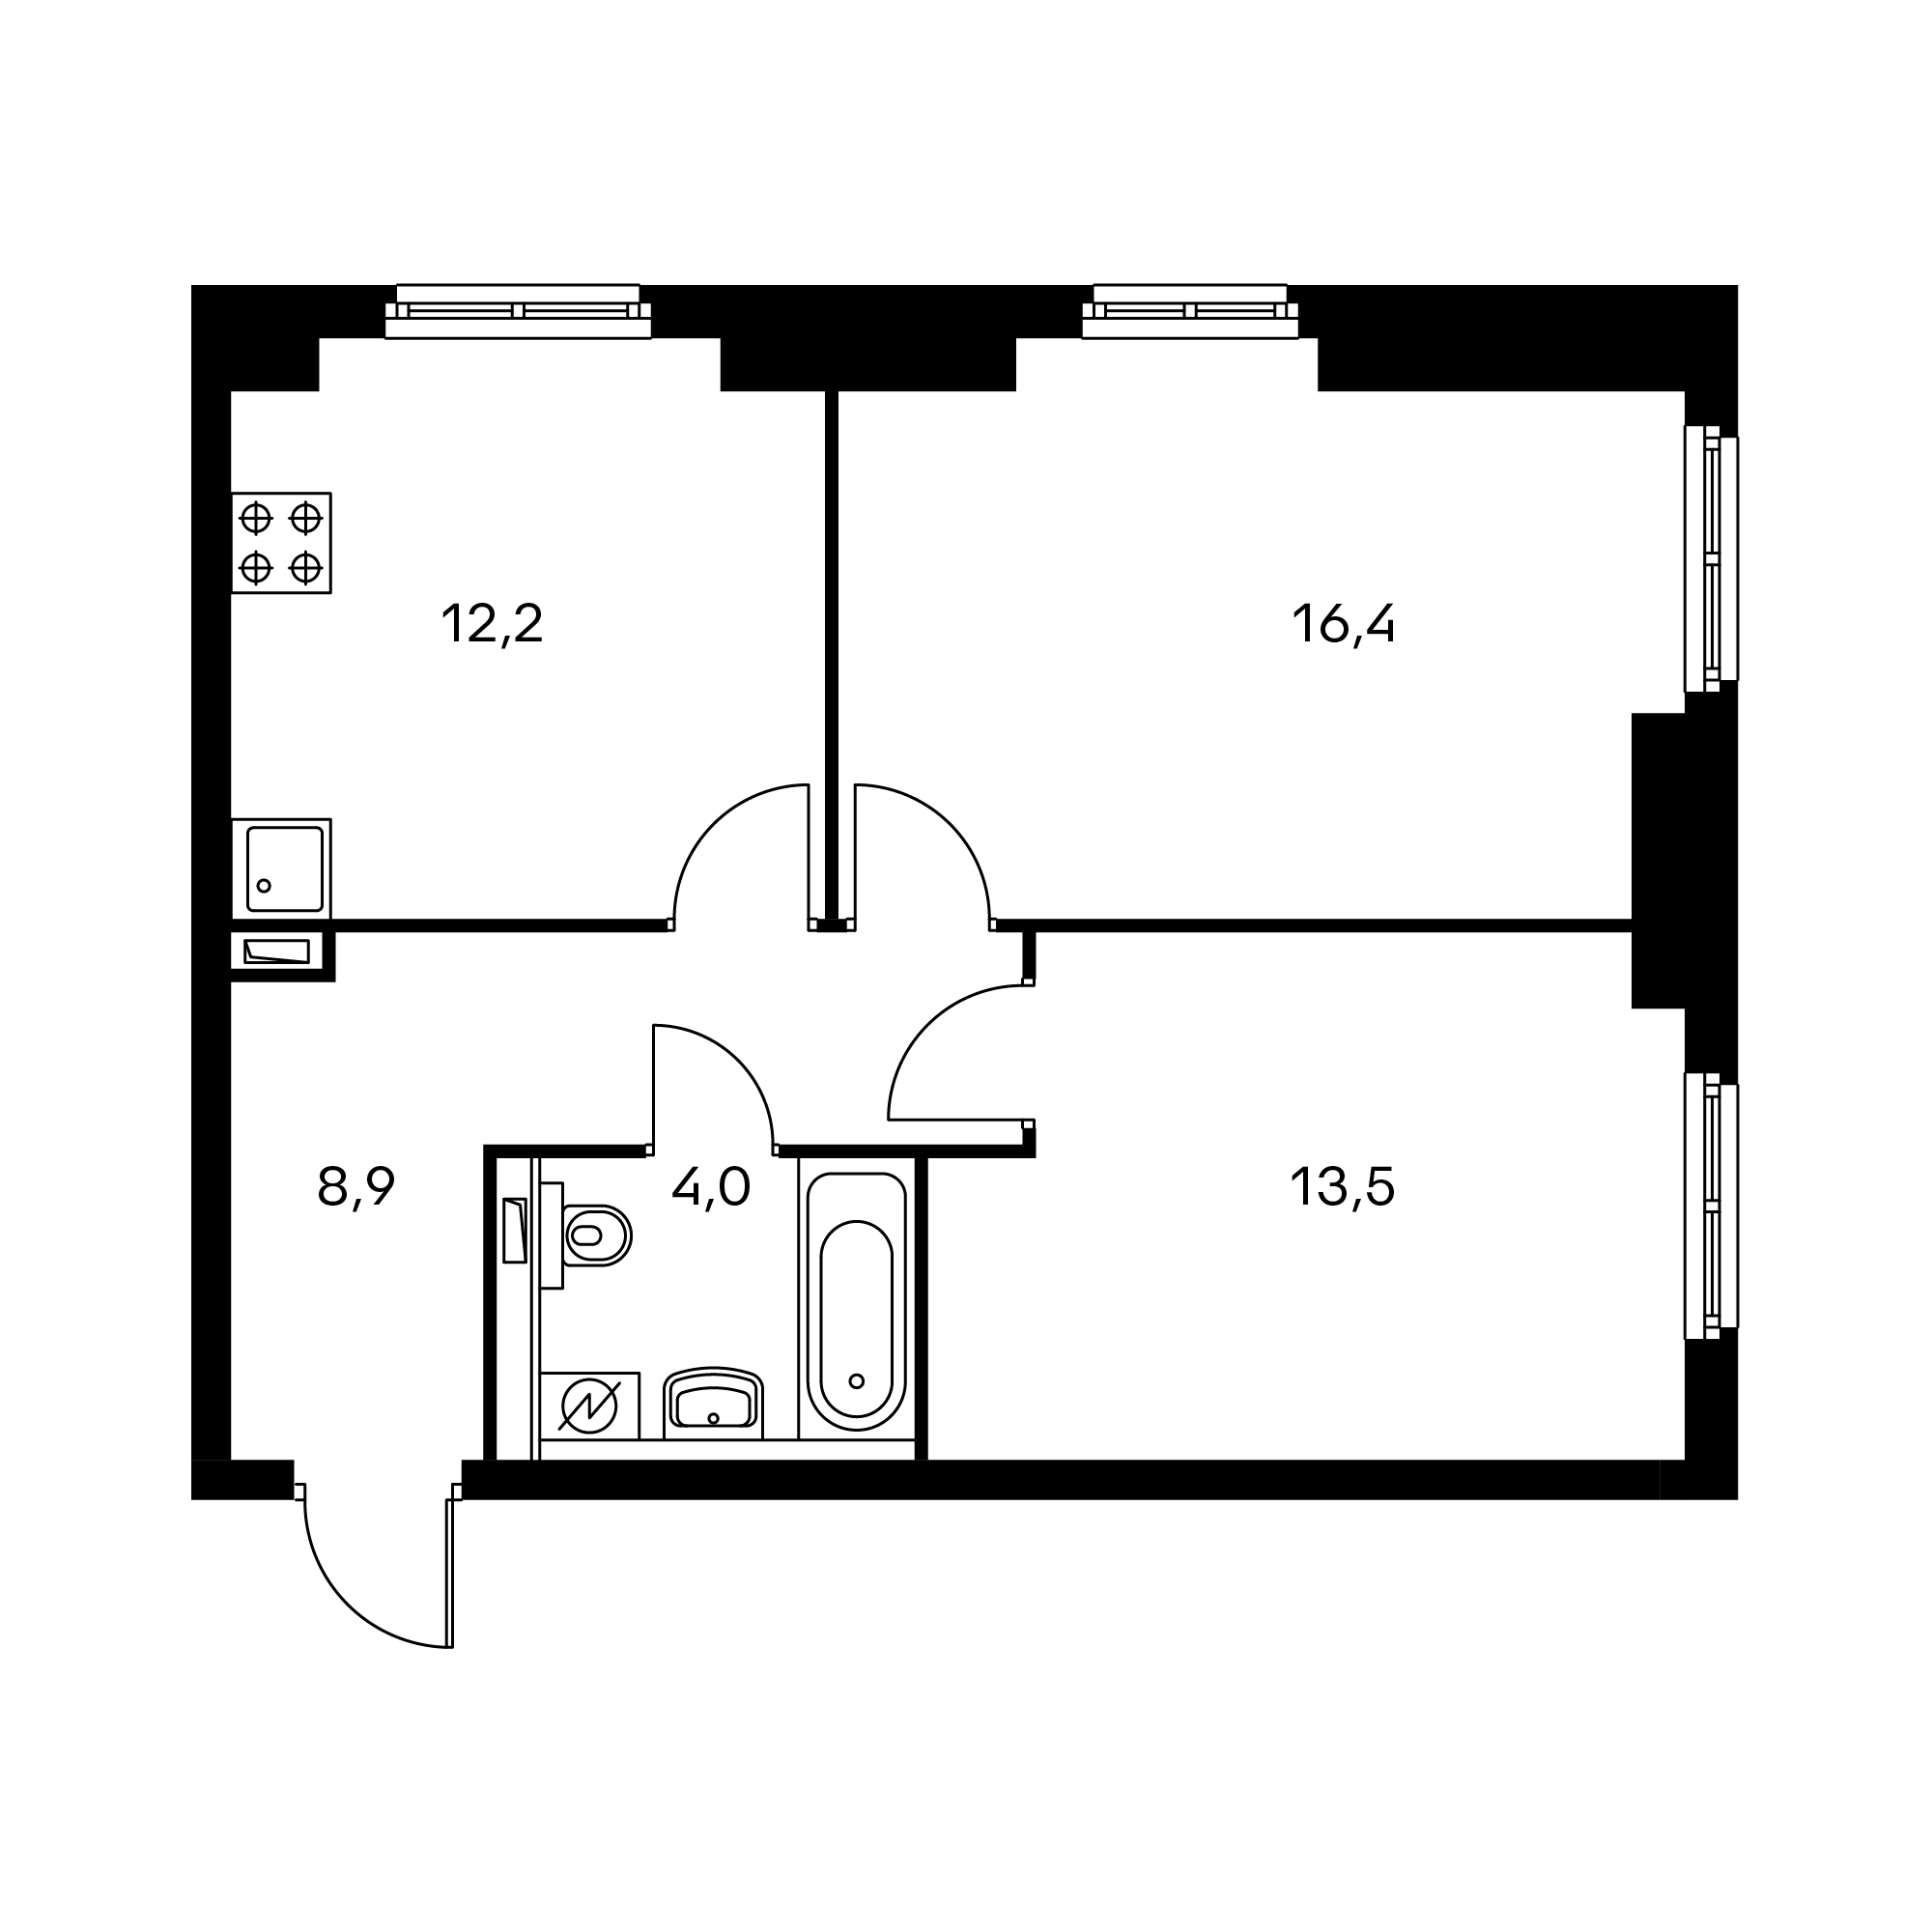 2KM1_6.9-1SZ_T